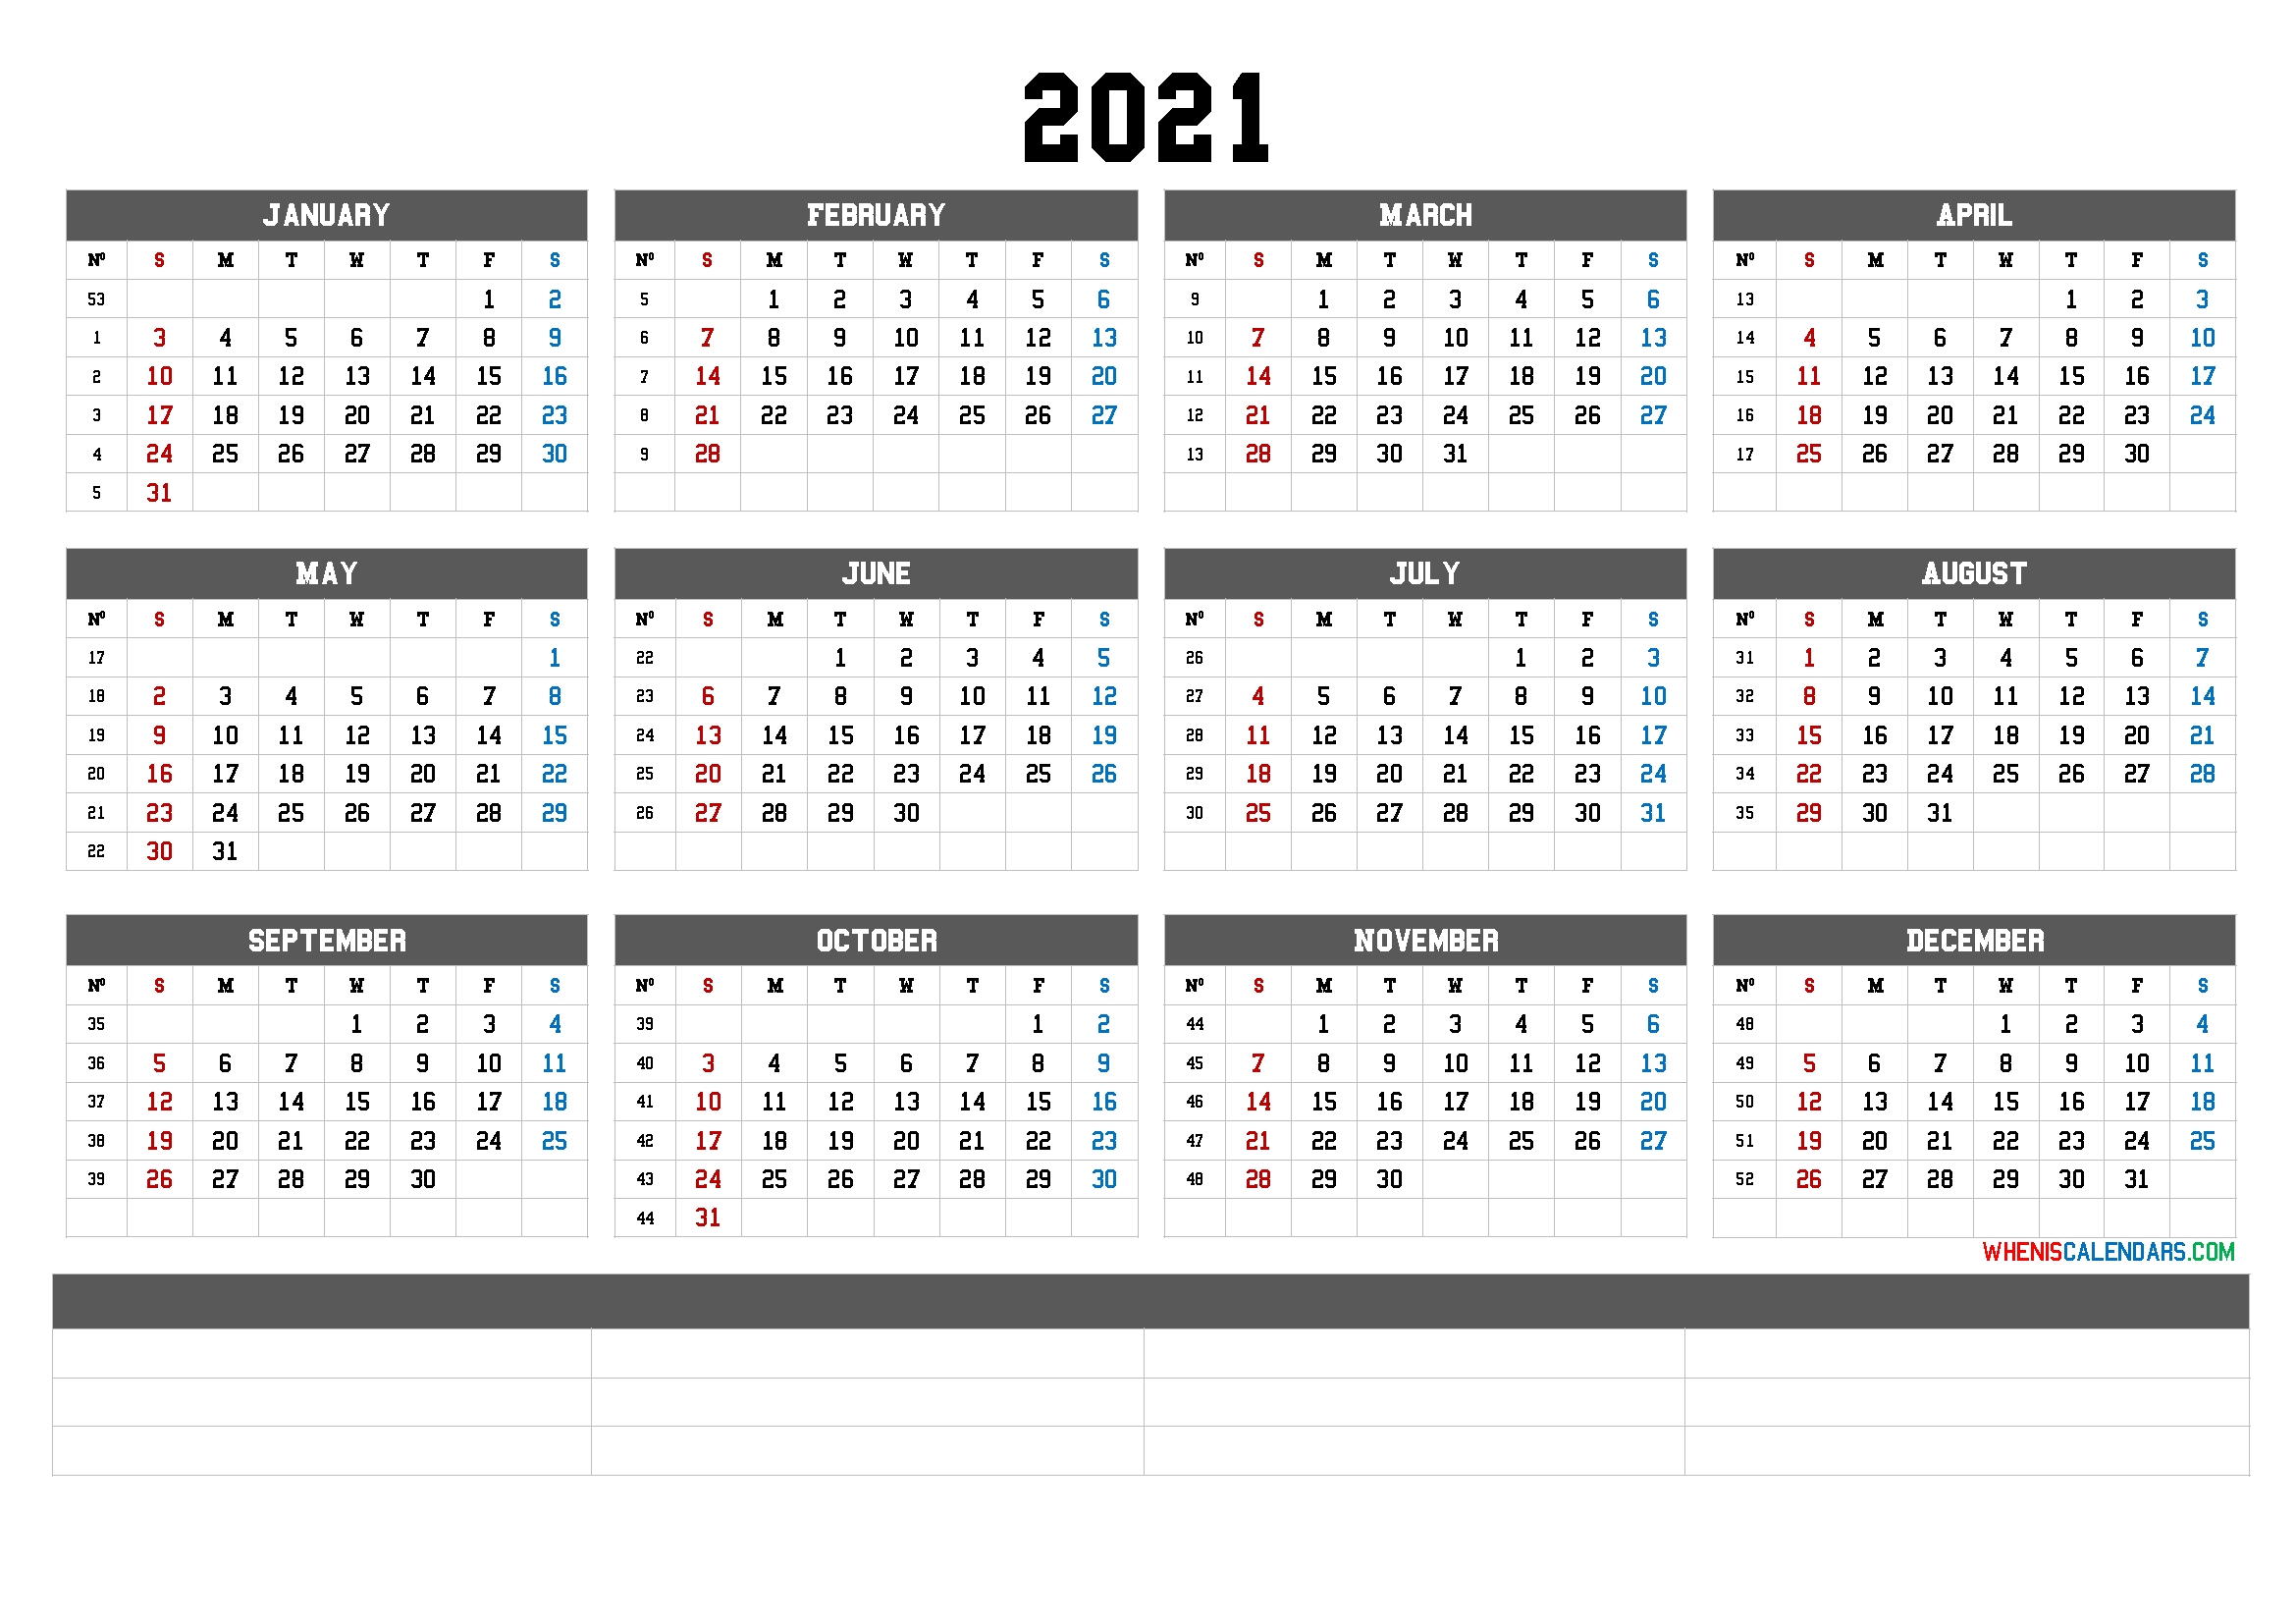 2021 yearly calendar template word 6 templates::Printable 2021 Calendar By Week